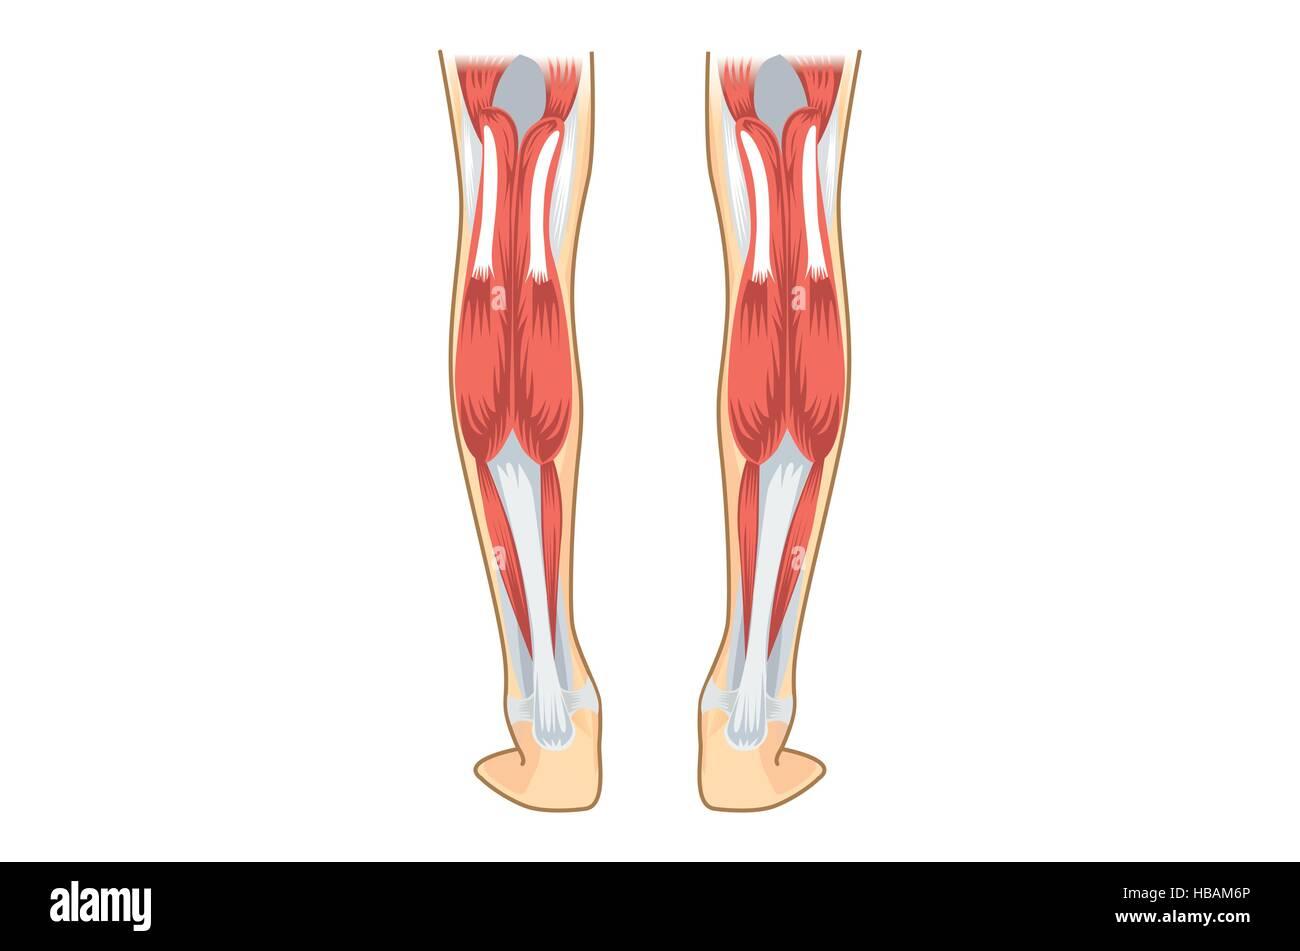 Calf Muscle Of Human Stock Vector Art Illustration Vector Image